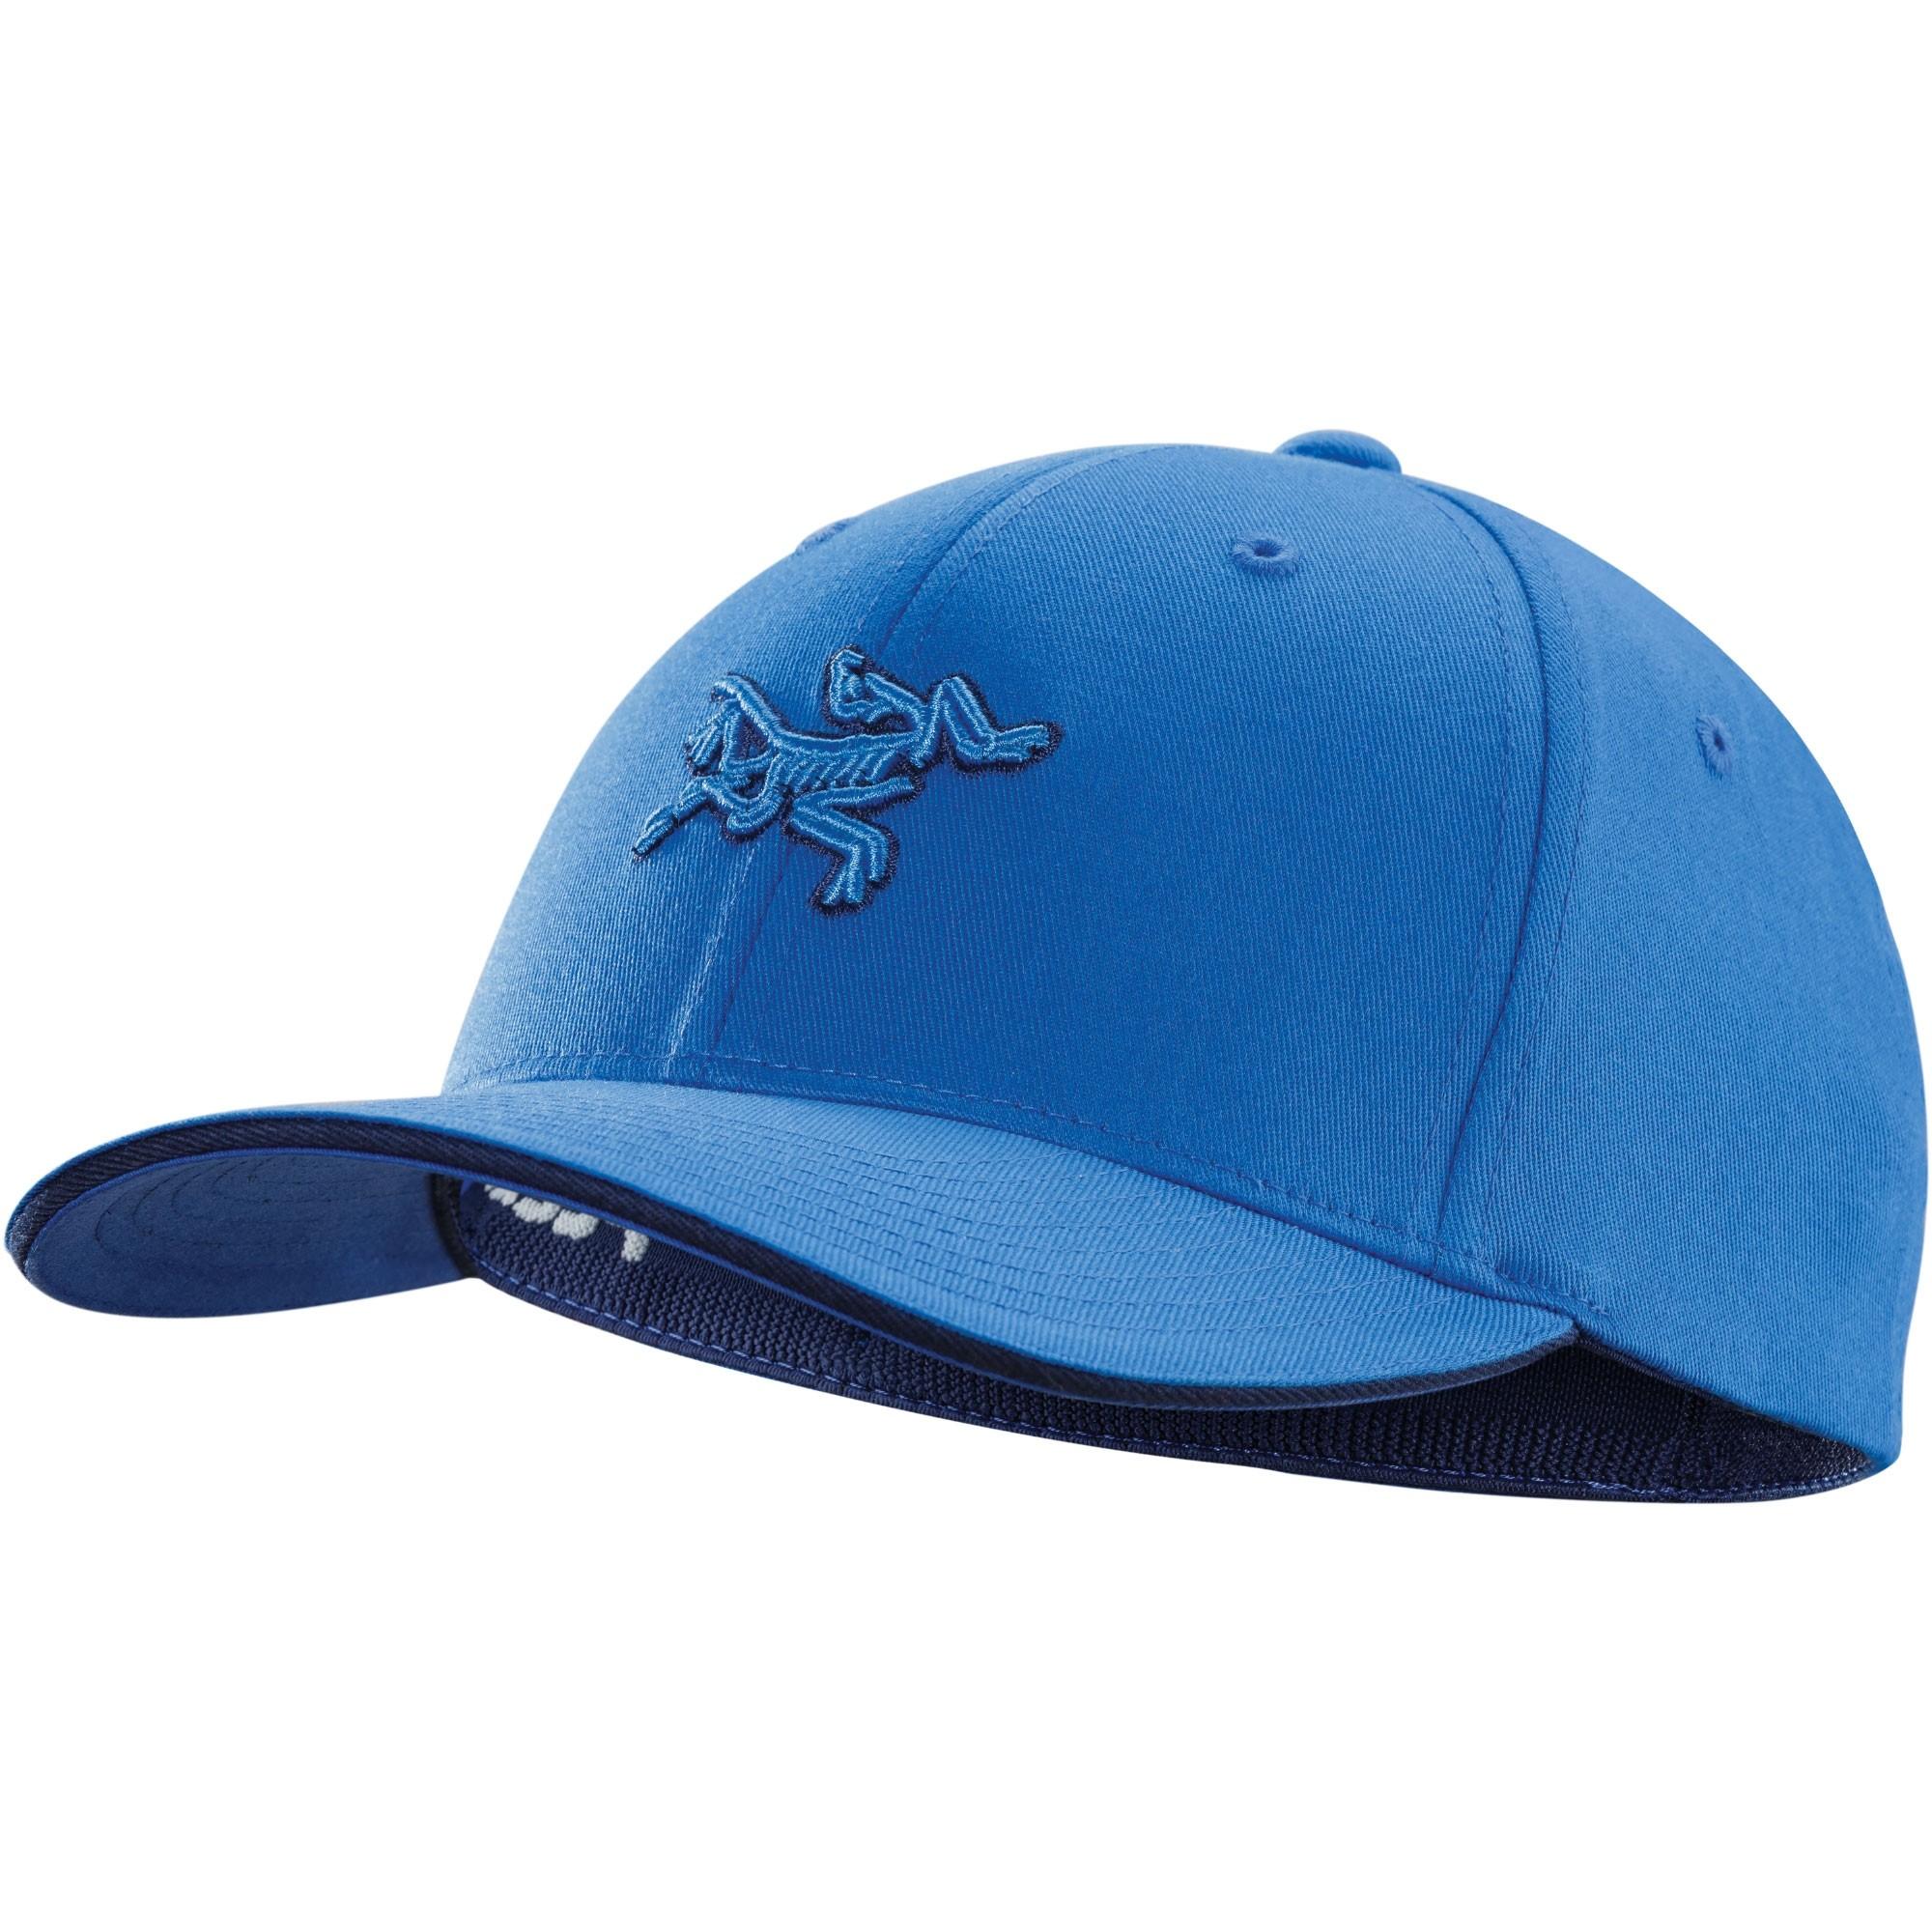 Arcteryx-7978-Embroidered-Bird-Cap-U-Deja-Blue-S18